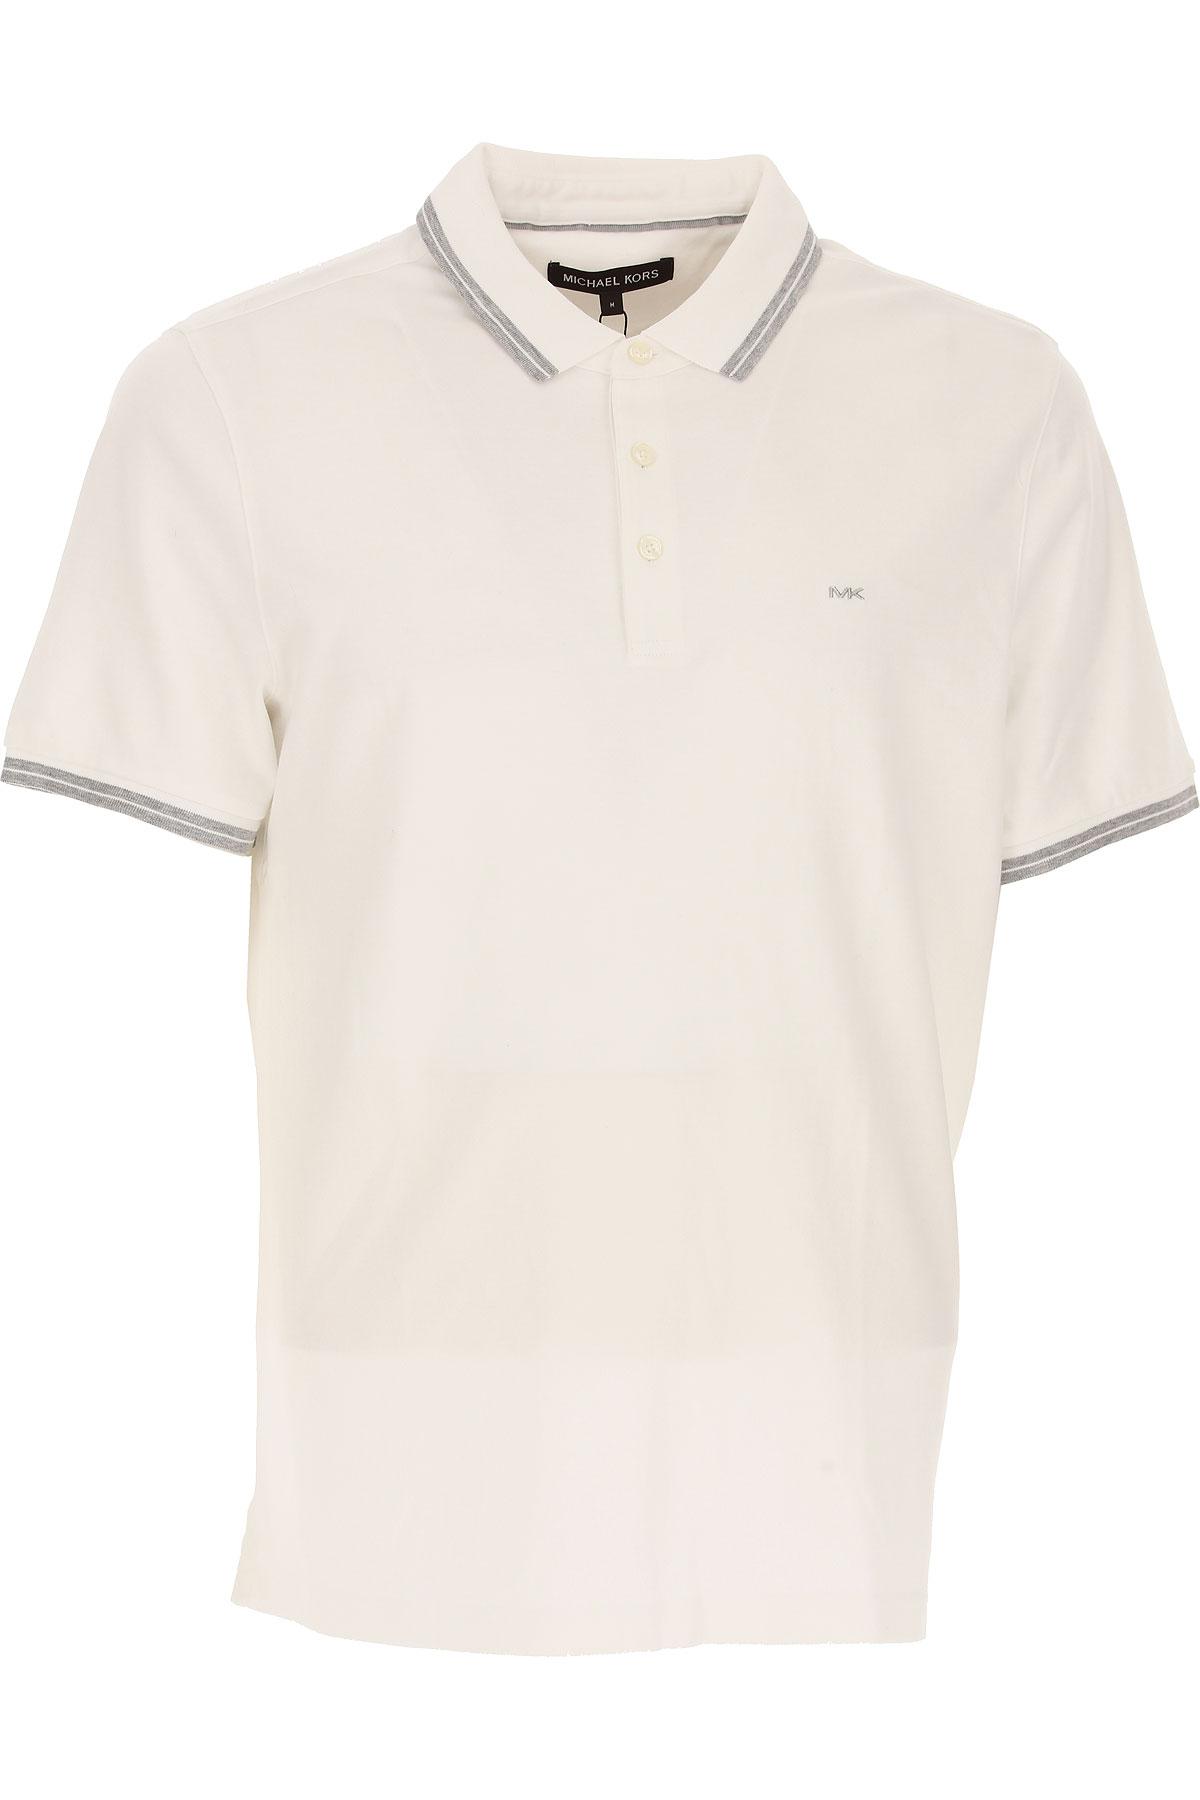 Michael Kors Polohemd für Herren, Polo-Hemd, Polo-Shirt Günstig im Outlet Sale, Weiss, Baumwolle, 2017, M S XL XXL